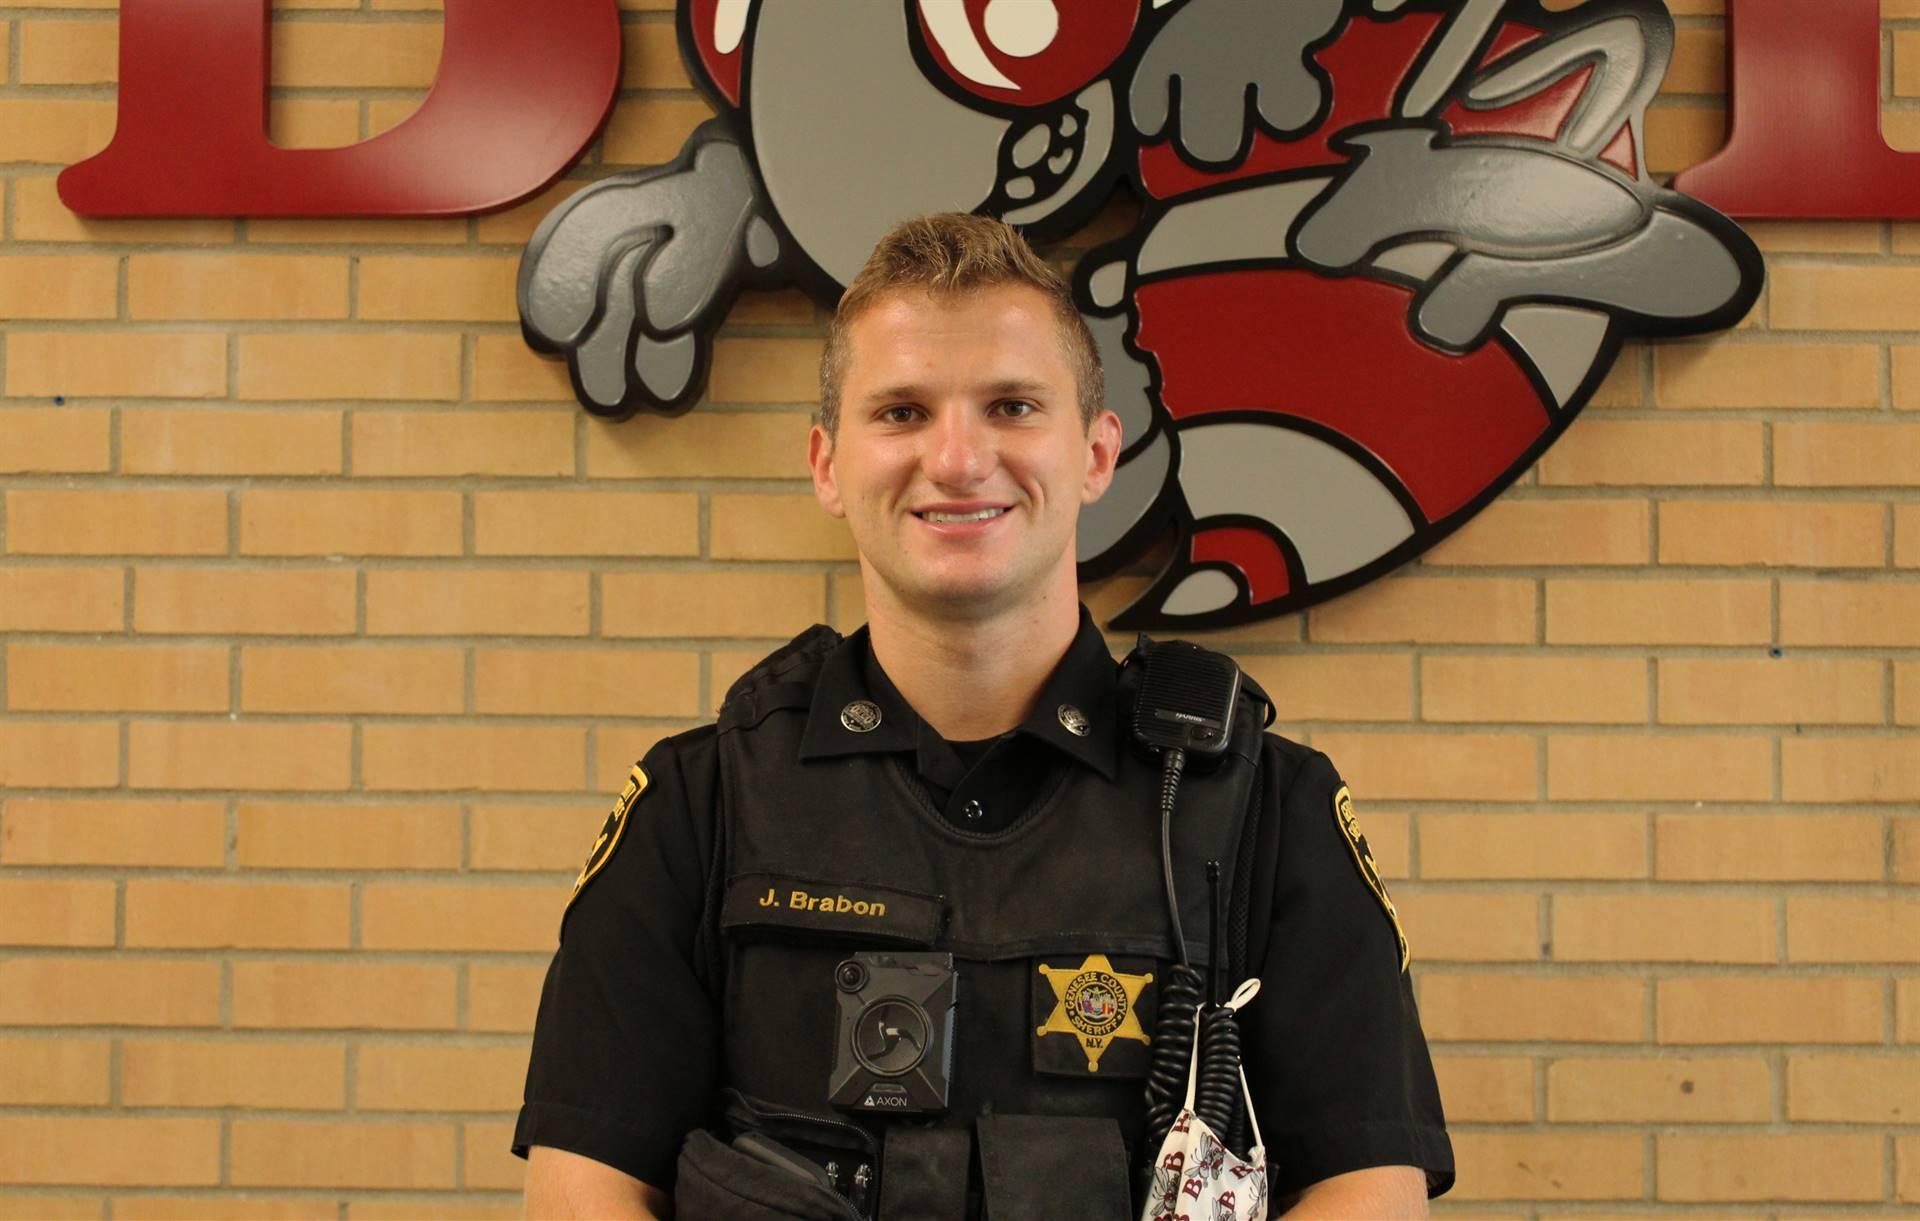 Deputy Brabon